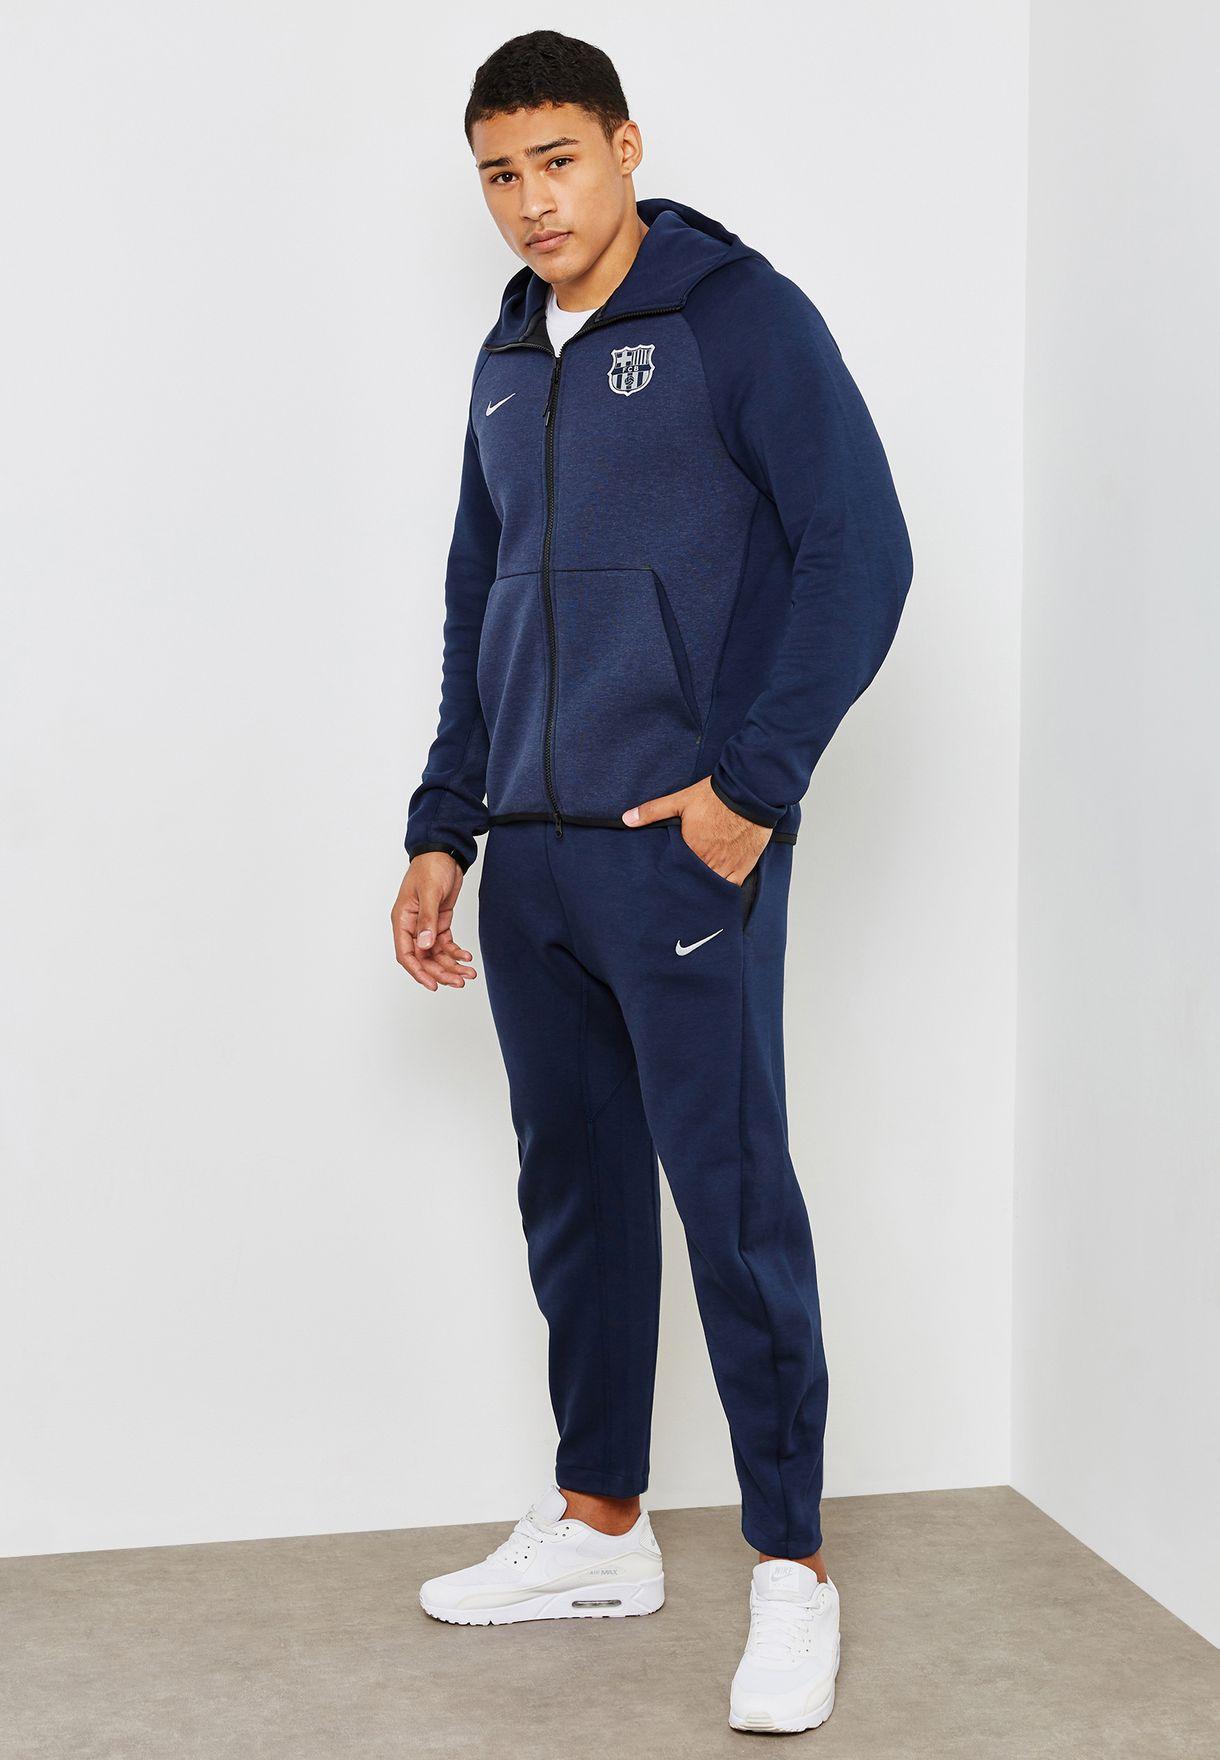 ee0bd0c19812 Shop Nike navy FC Barcelona Tech Fleece Authentic Sweatpants AH5463 ...